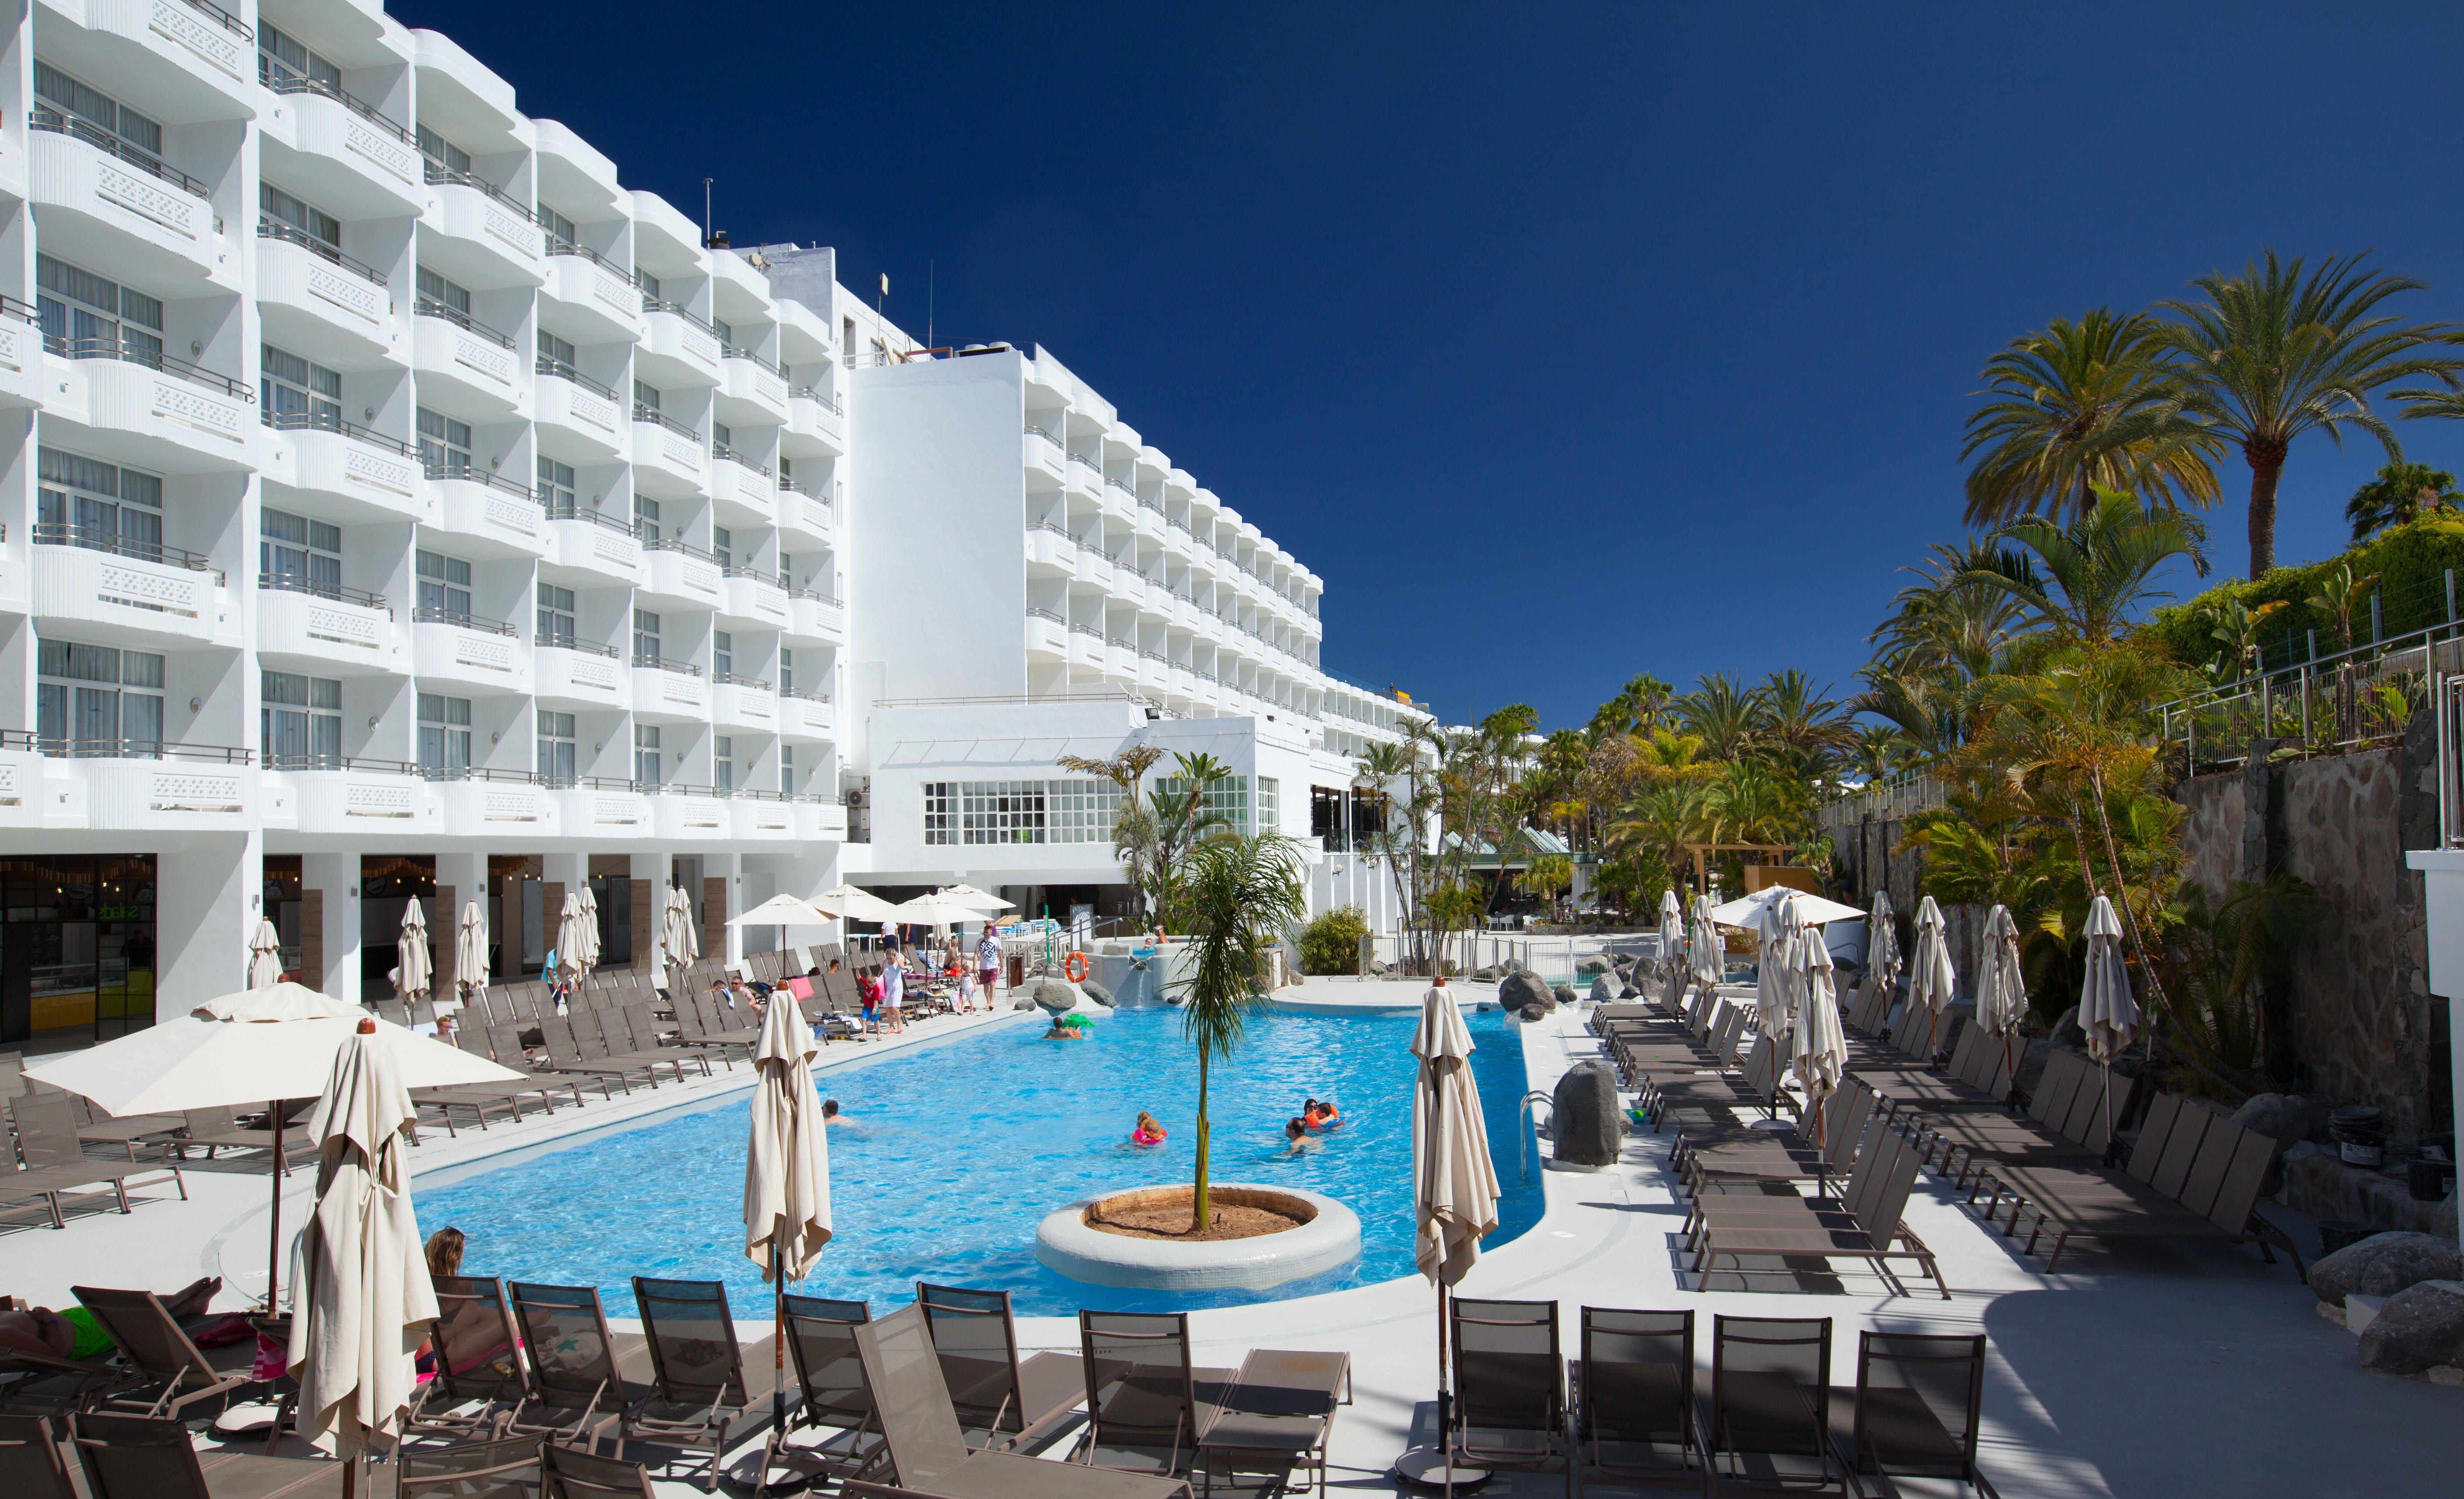 Galer a hotel abora catarina en gran canaria web oficial for Piscina playa del ingles